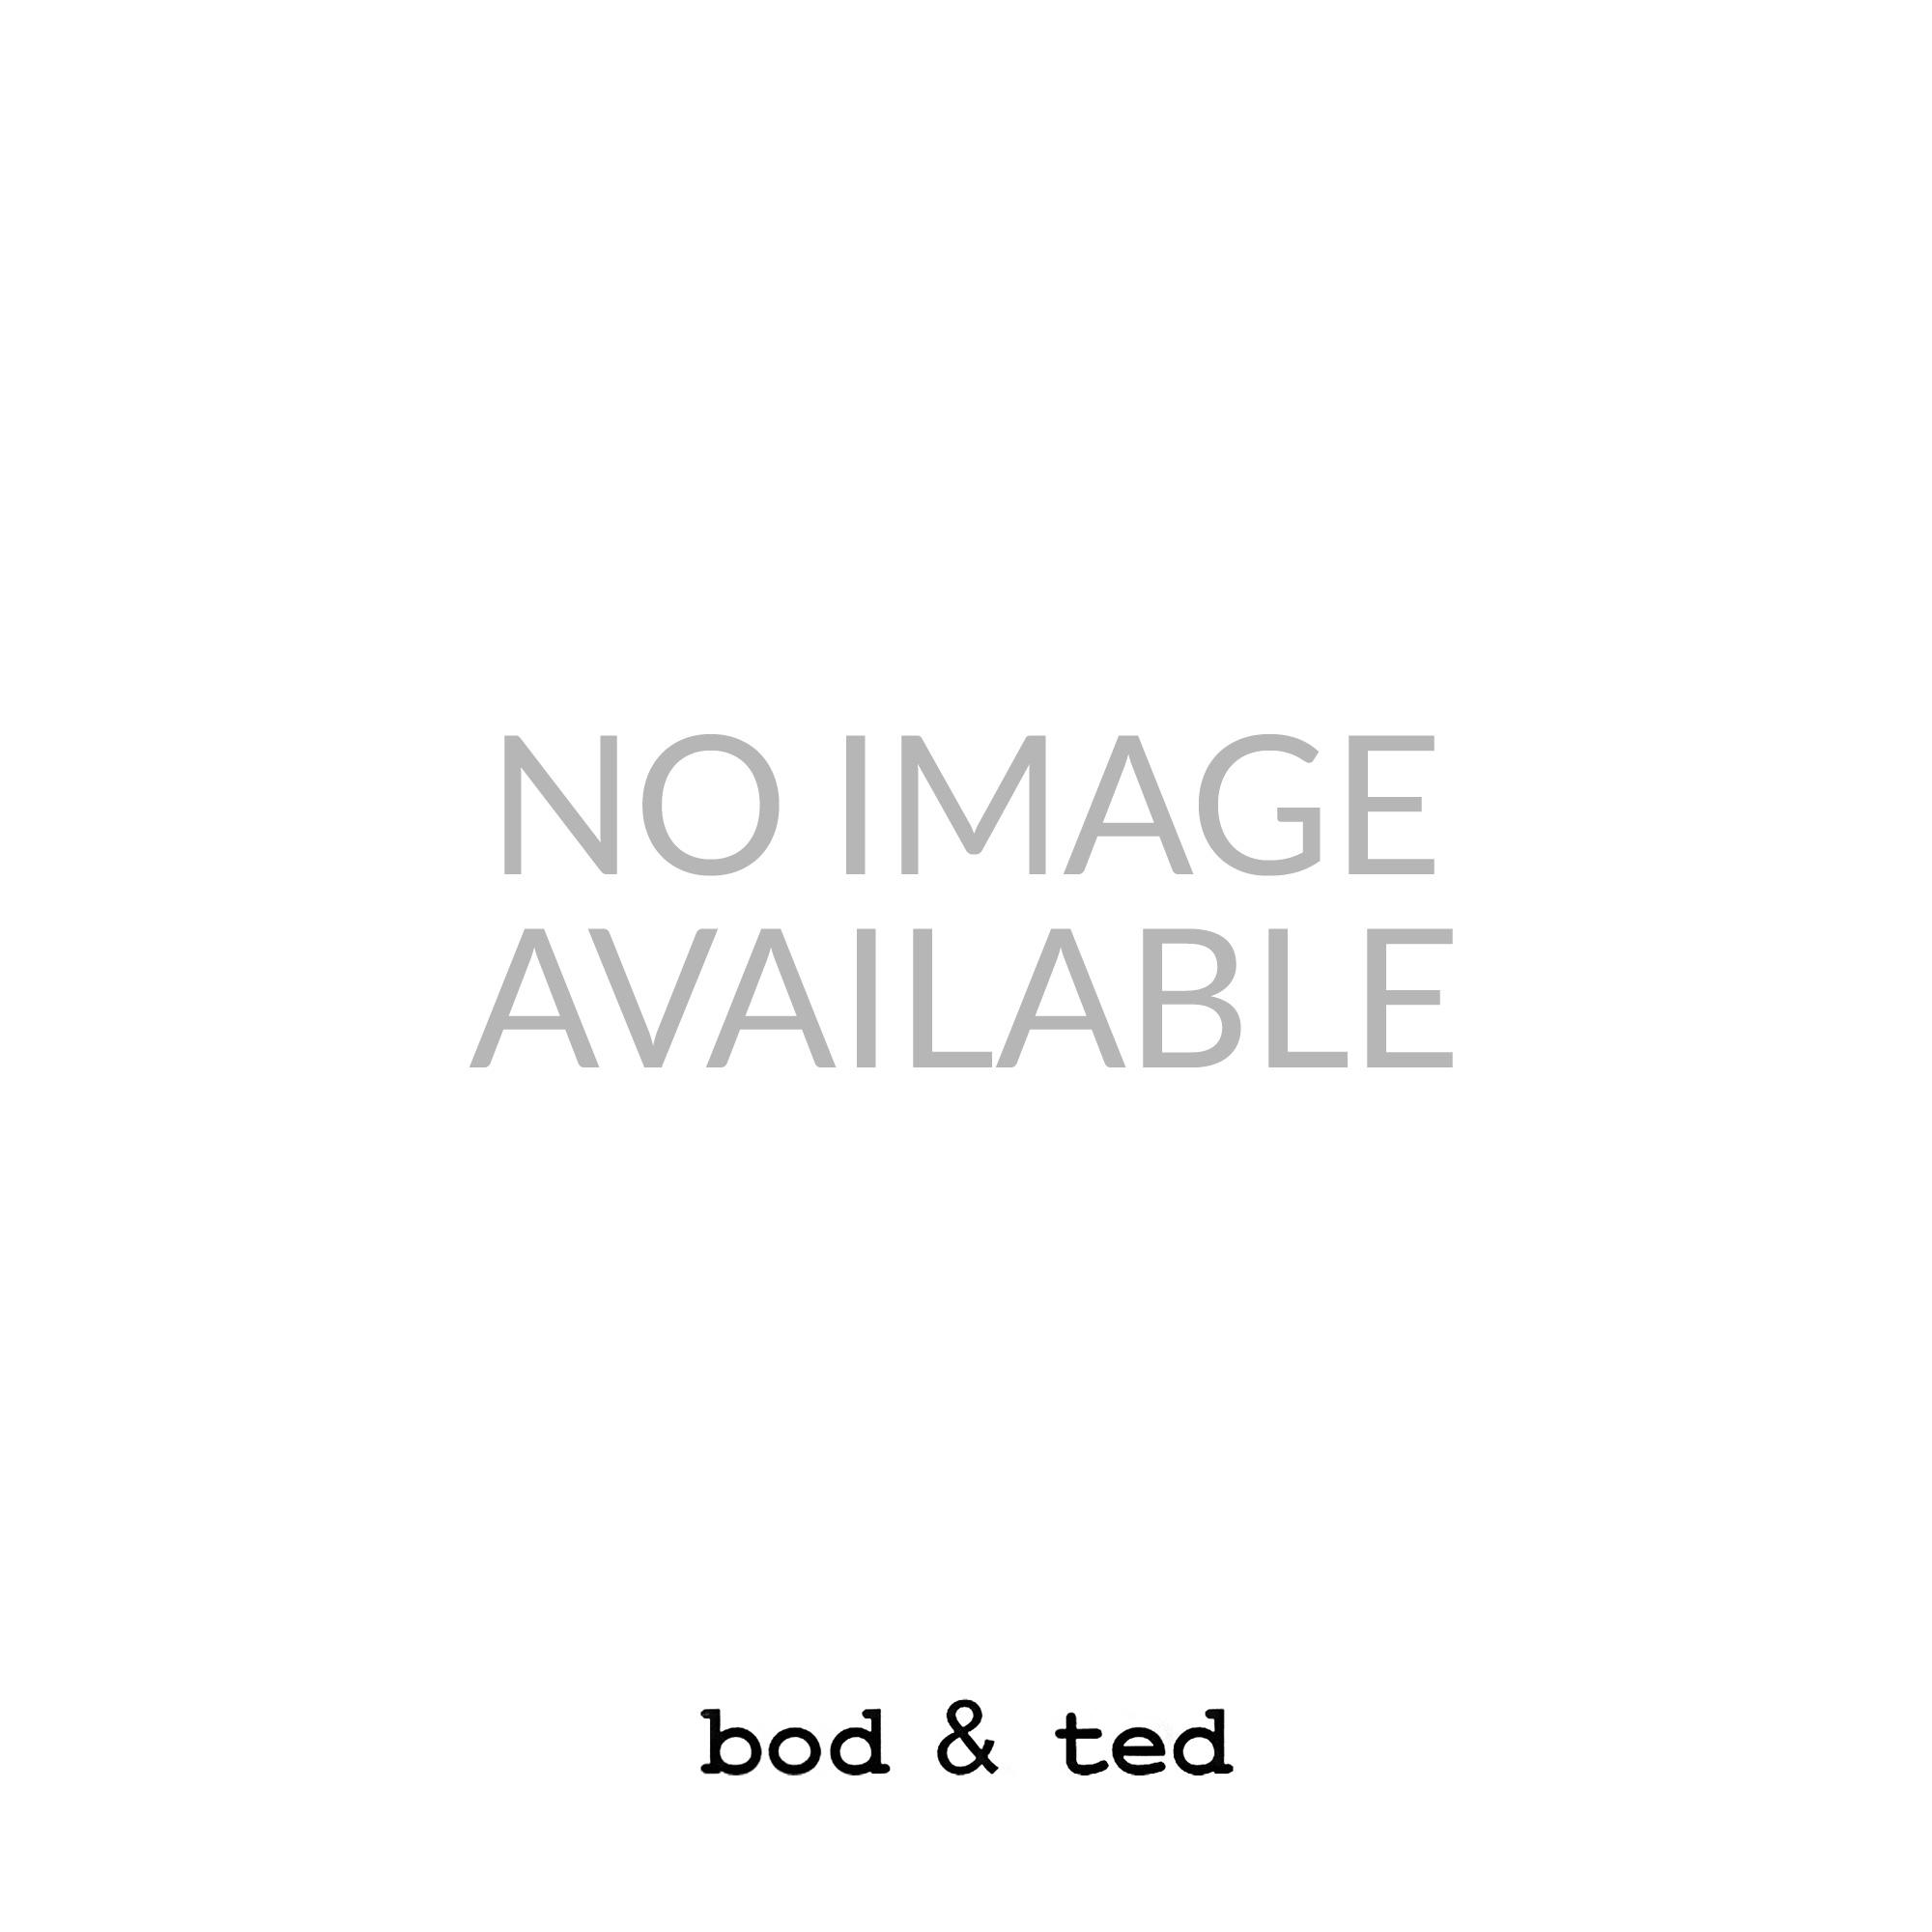 Essentiel Antwerp Rashmir Flounced Silk Dress in Pixel Paisley Black